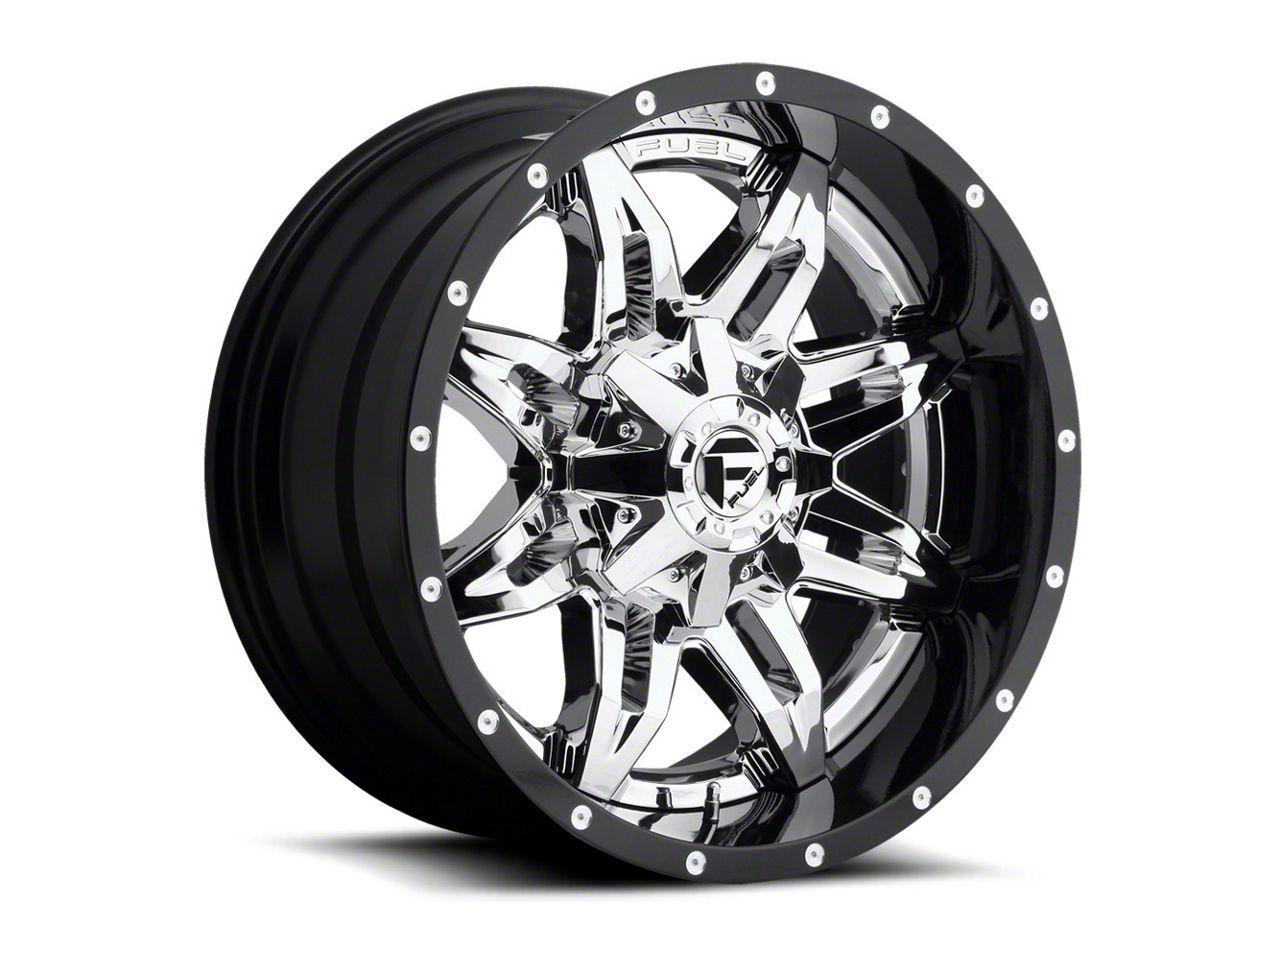 Fuel Wheels Lethal Chrome 6-Lug Wheel - 20x12 (99-18 Silverado 1500)